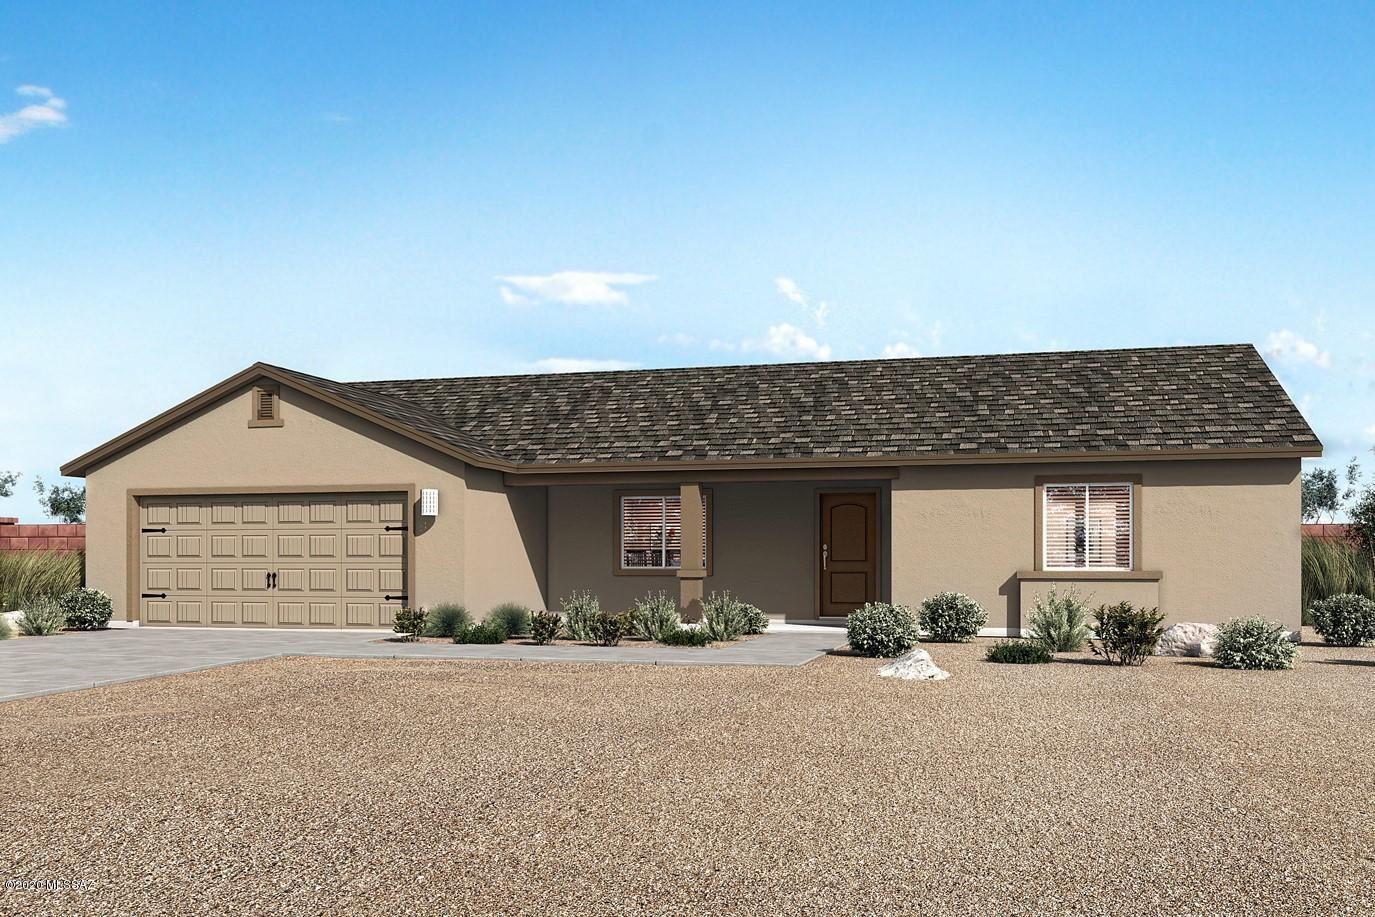 7024 S Victor Drive, Tucson, AZ 85757 - MLS#: 22016335